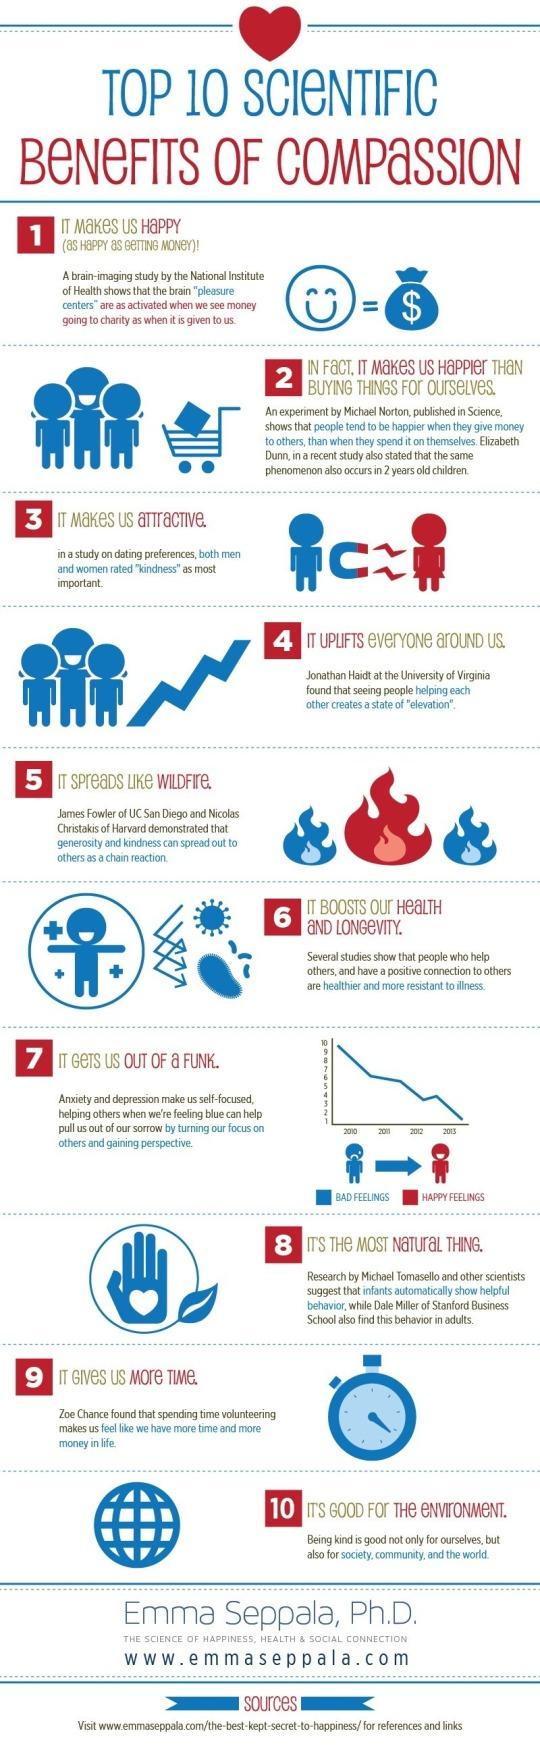 post-34587-infographic-top-10-scientific-lnz3.jpeg (800×2591)